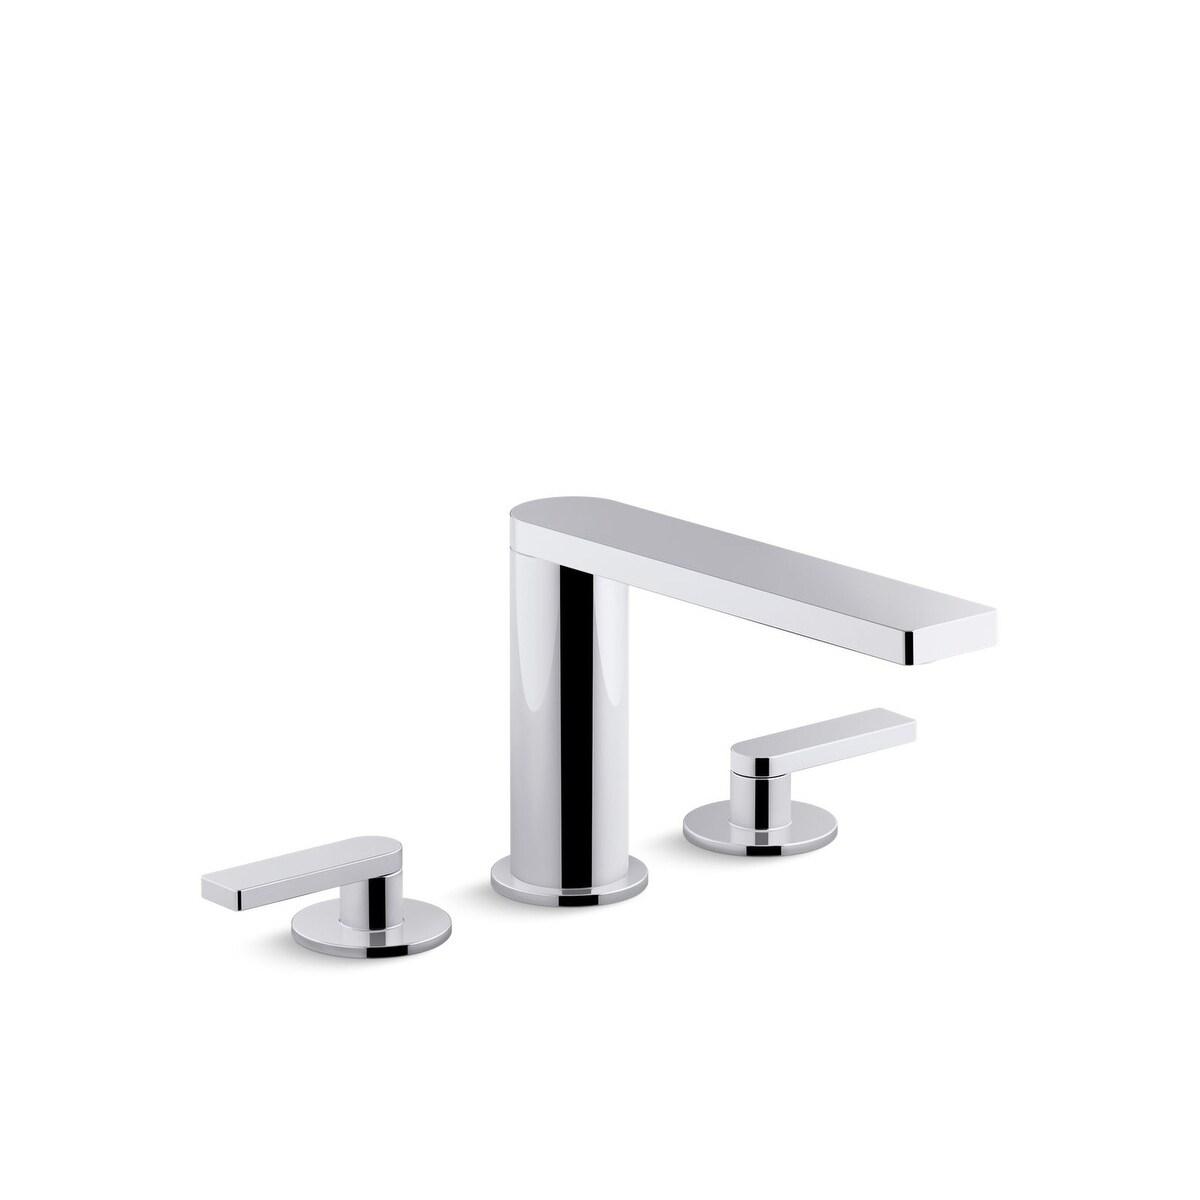 kohler composed widespread bathroom sink faucet with lever handles vibrant titanium